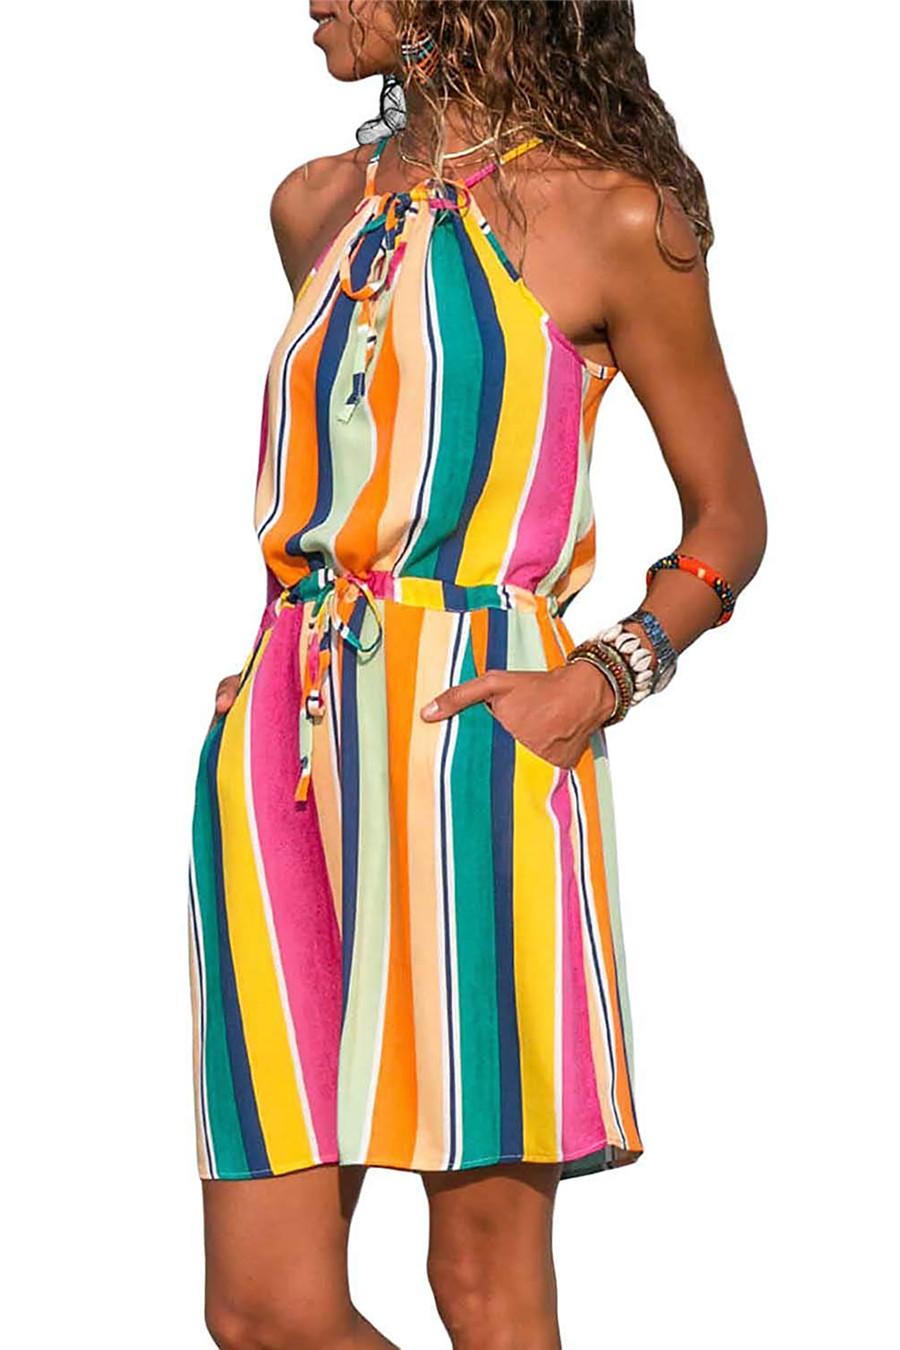 Gladiolus Chiffon Women Summer Dress Spaghetti Strap Floral Print Pocket Sexy Bohemian Beach Dress 2019 Short Ladies Dresses (35)